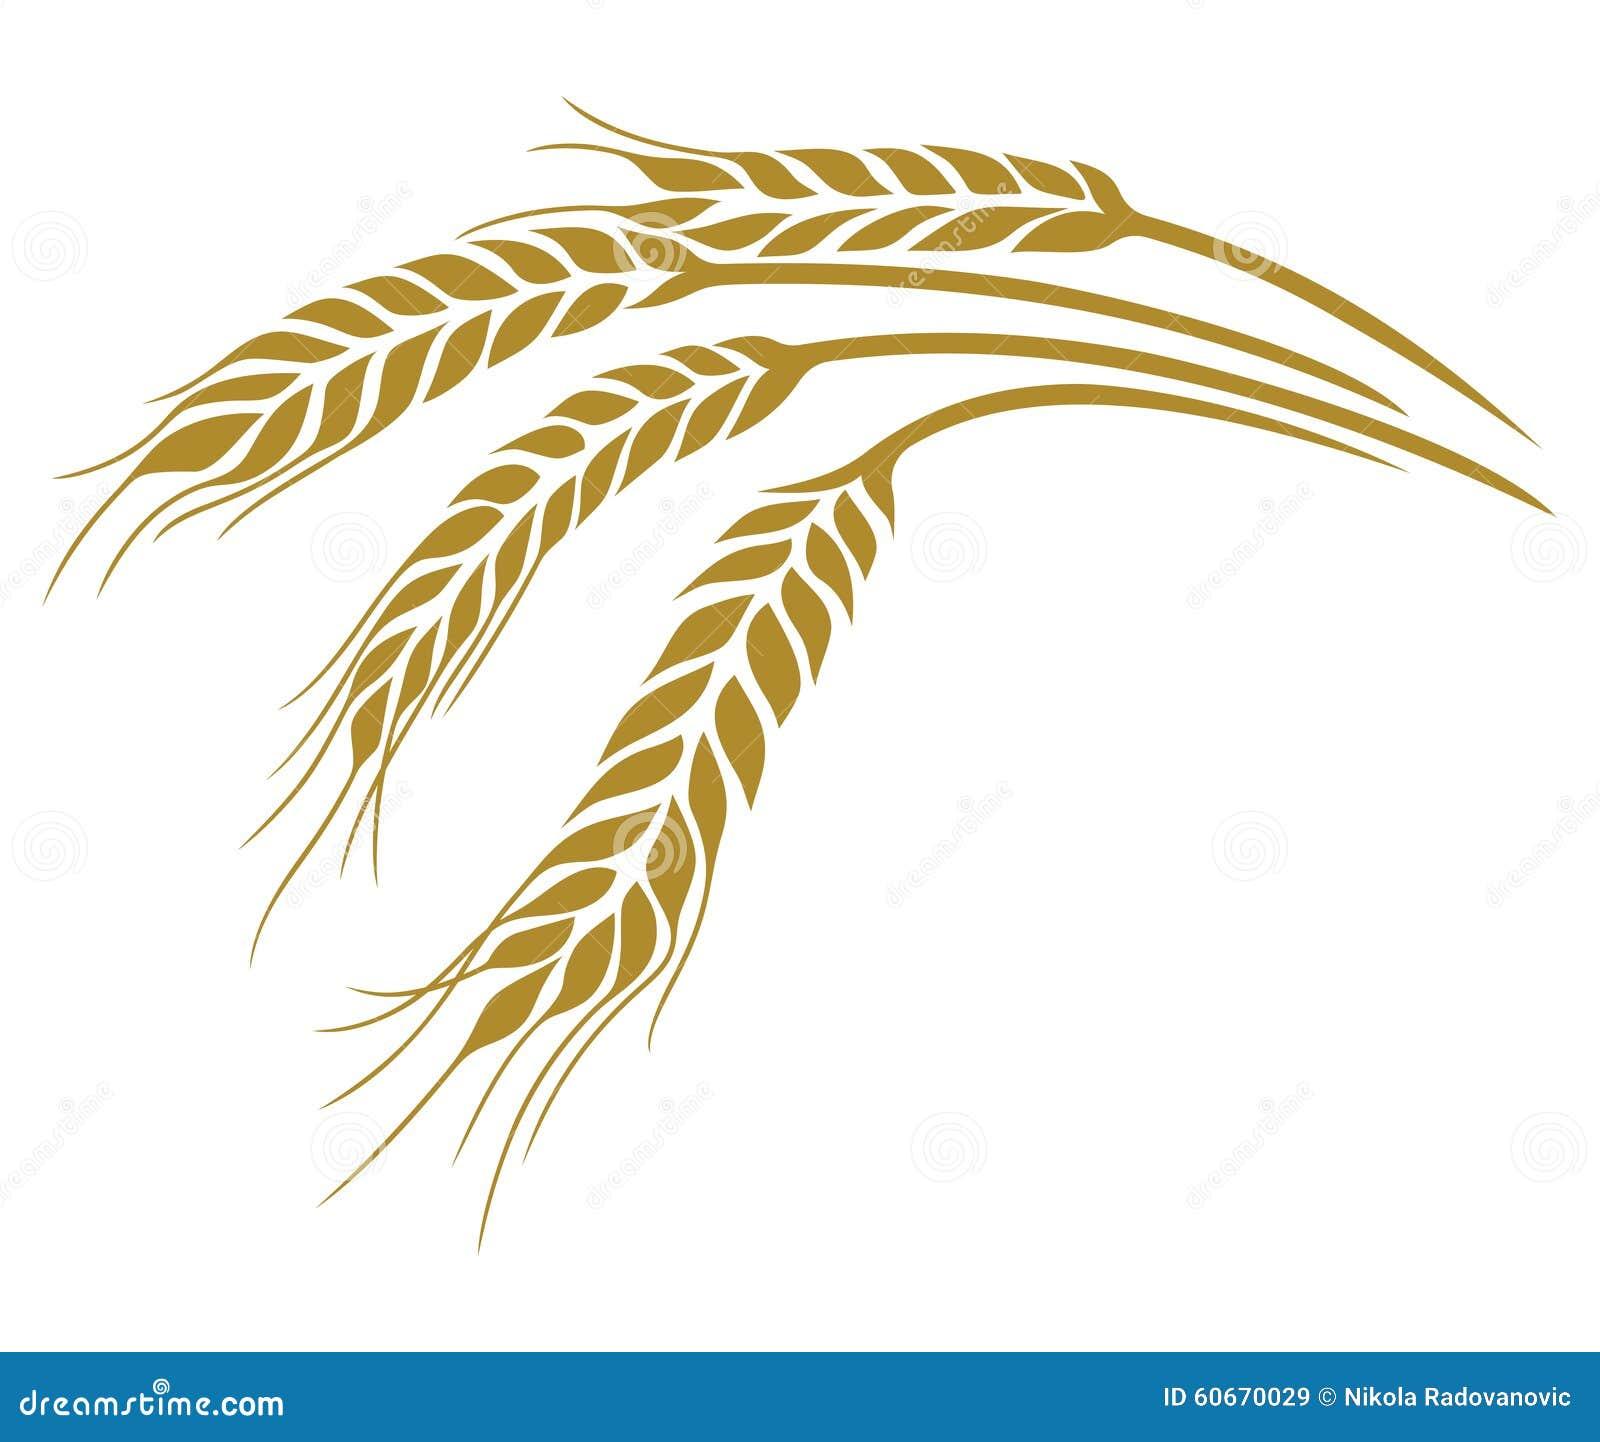 Wheat Stock Illustration - Image: 60670029